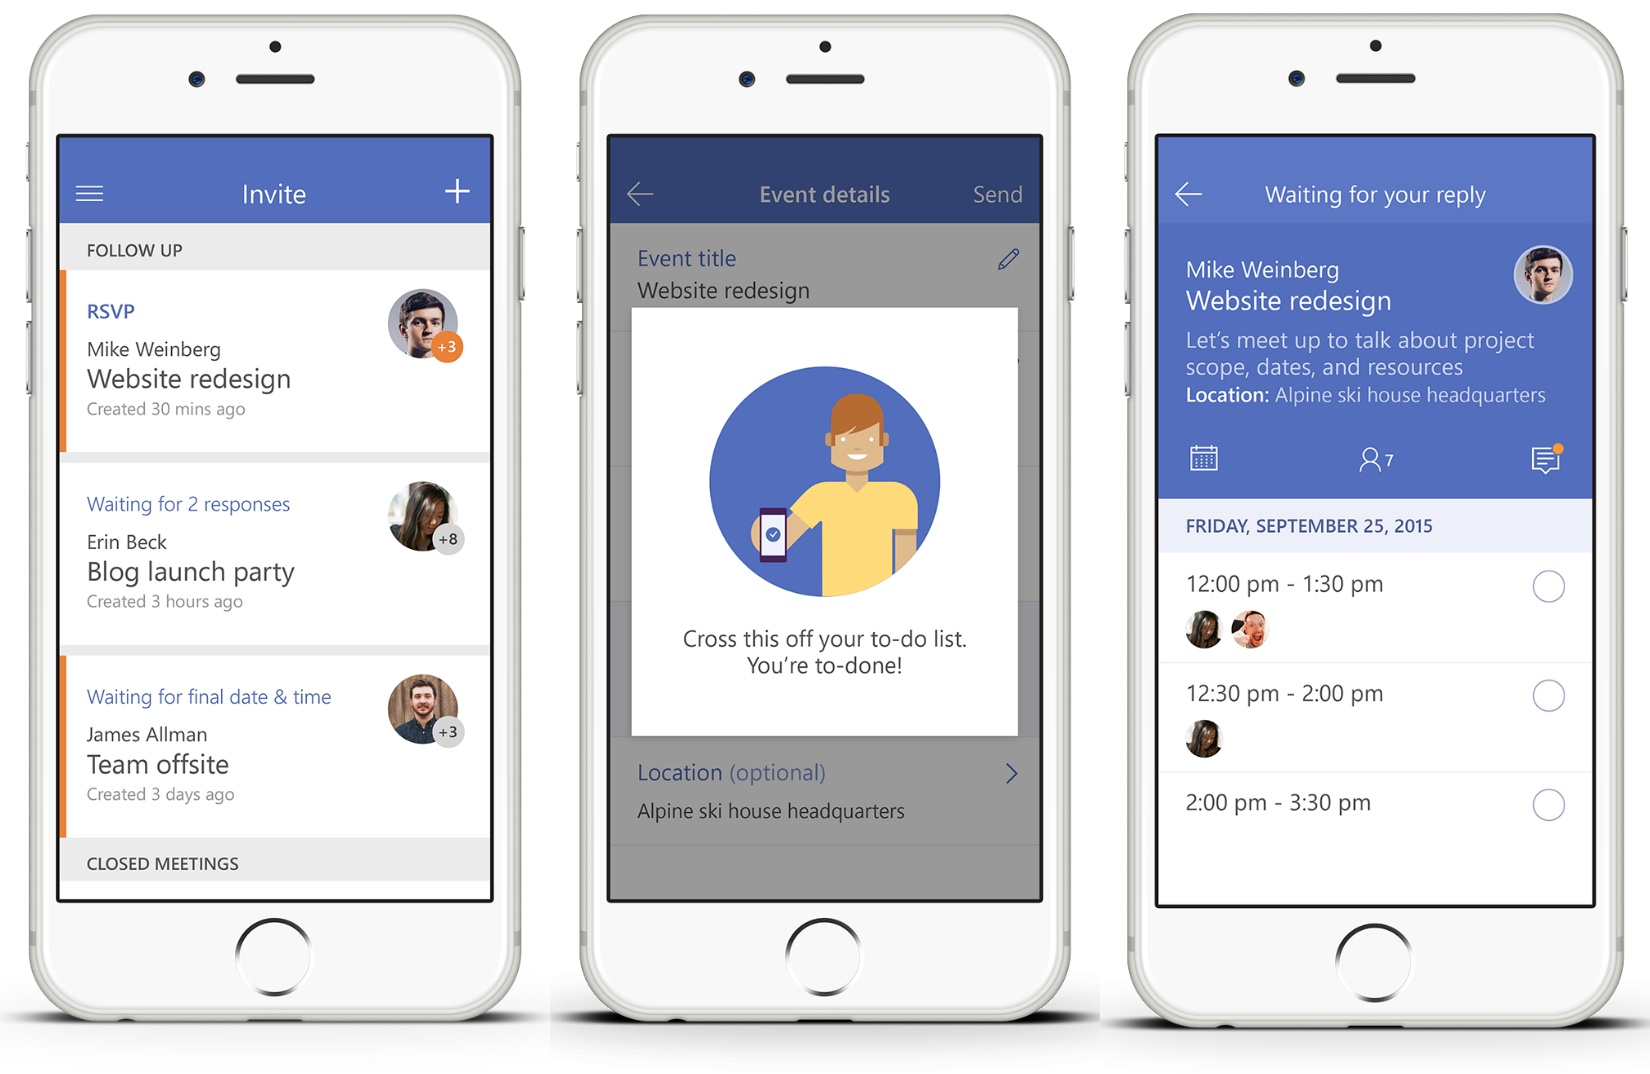 Microsoft Invite 1.0 for iOS iPhone screenshot 001